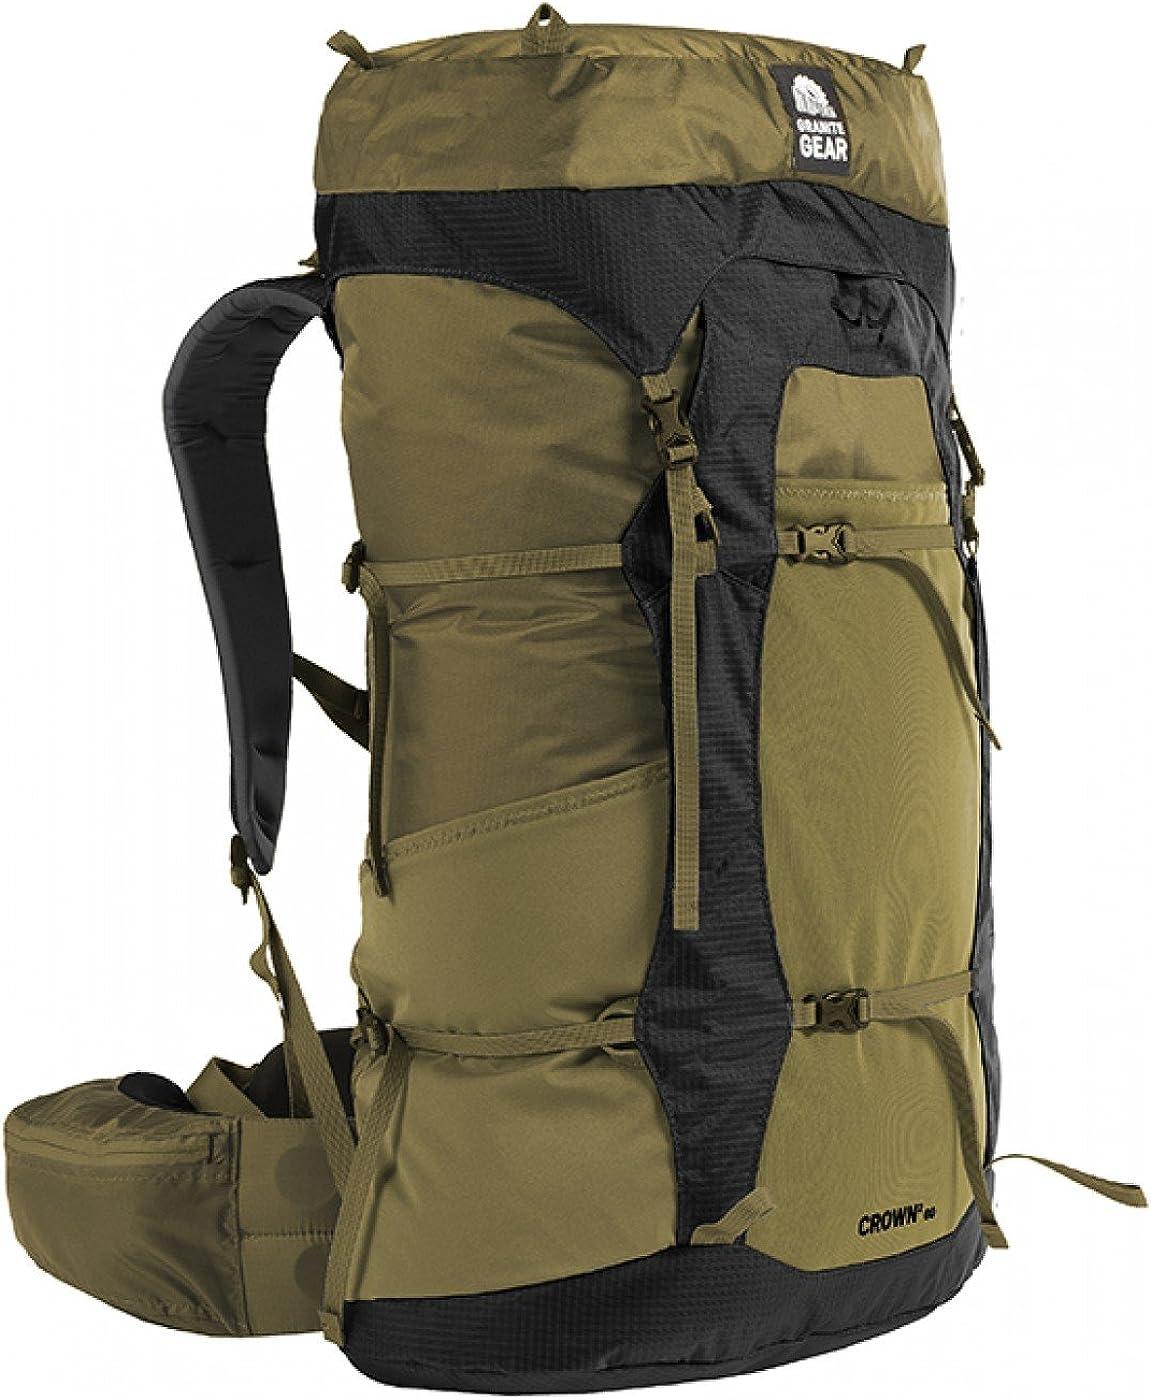 Granite Gear Crown 2 60 Backpack - Men's